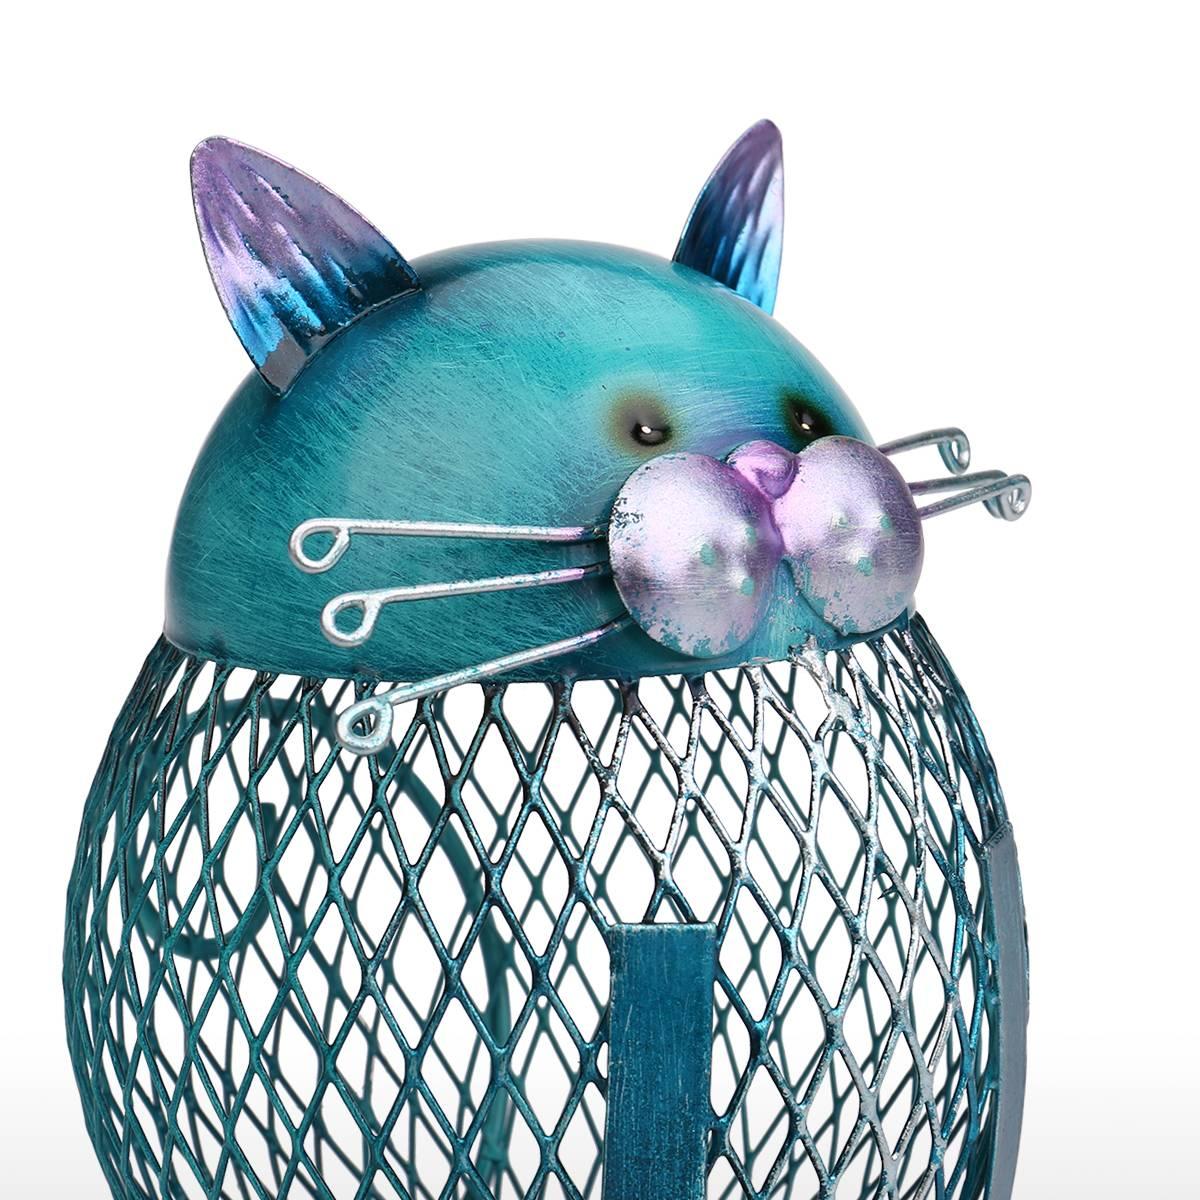 Tooarts-Blue-Cat-Figurine-Piggy-Bank-Metal-Figurine-Animal-Money-Box-Vintage-Home-Decor-Shaped-Home-Decoration-Crafts-For-Home-1